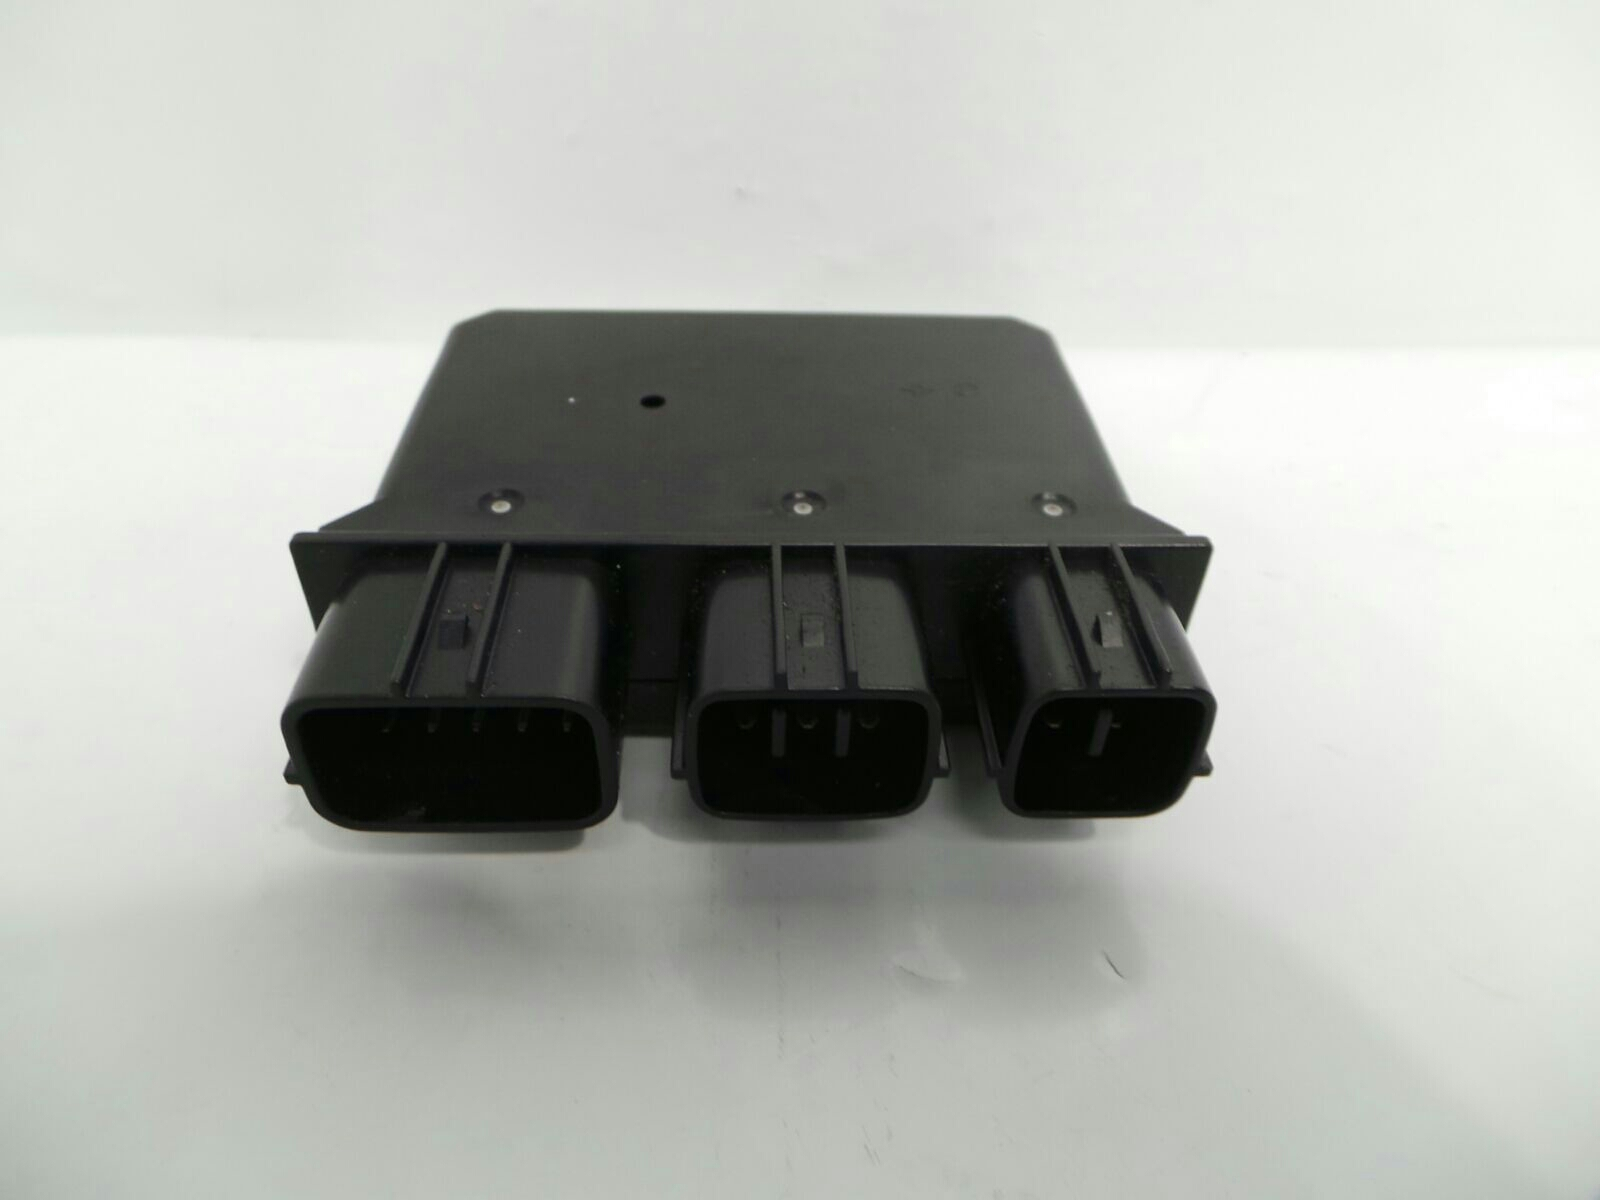 Fuse Box Diagram 1995 Zx 600r Electrical Wiring Diagrams 600 Kawasaki Zx600r Trusted Schematic U2022 Rh Sarome Co Ford Ranger